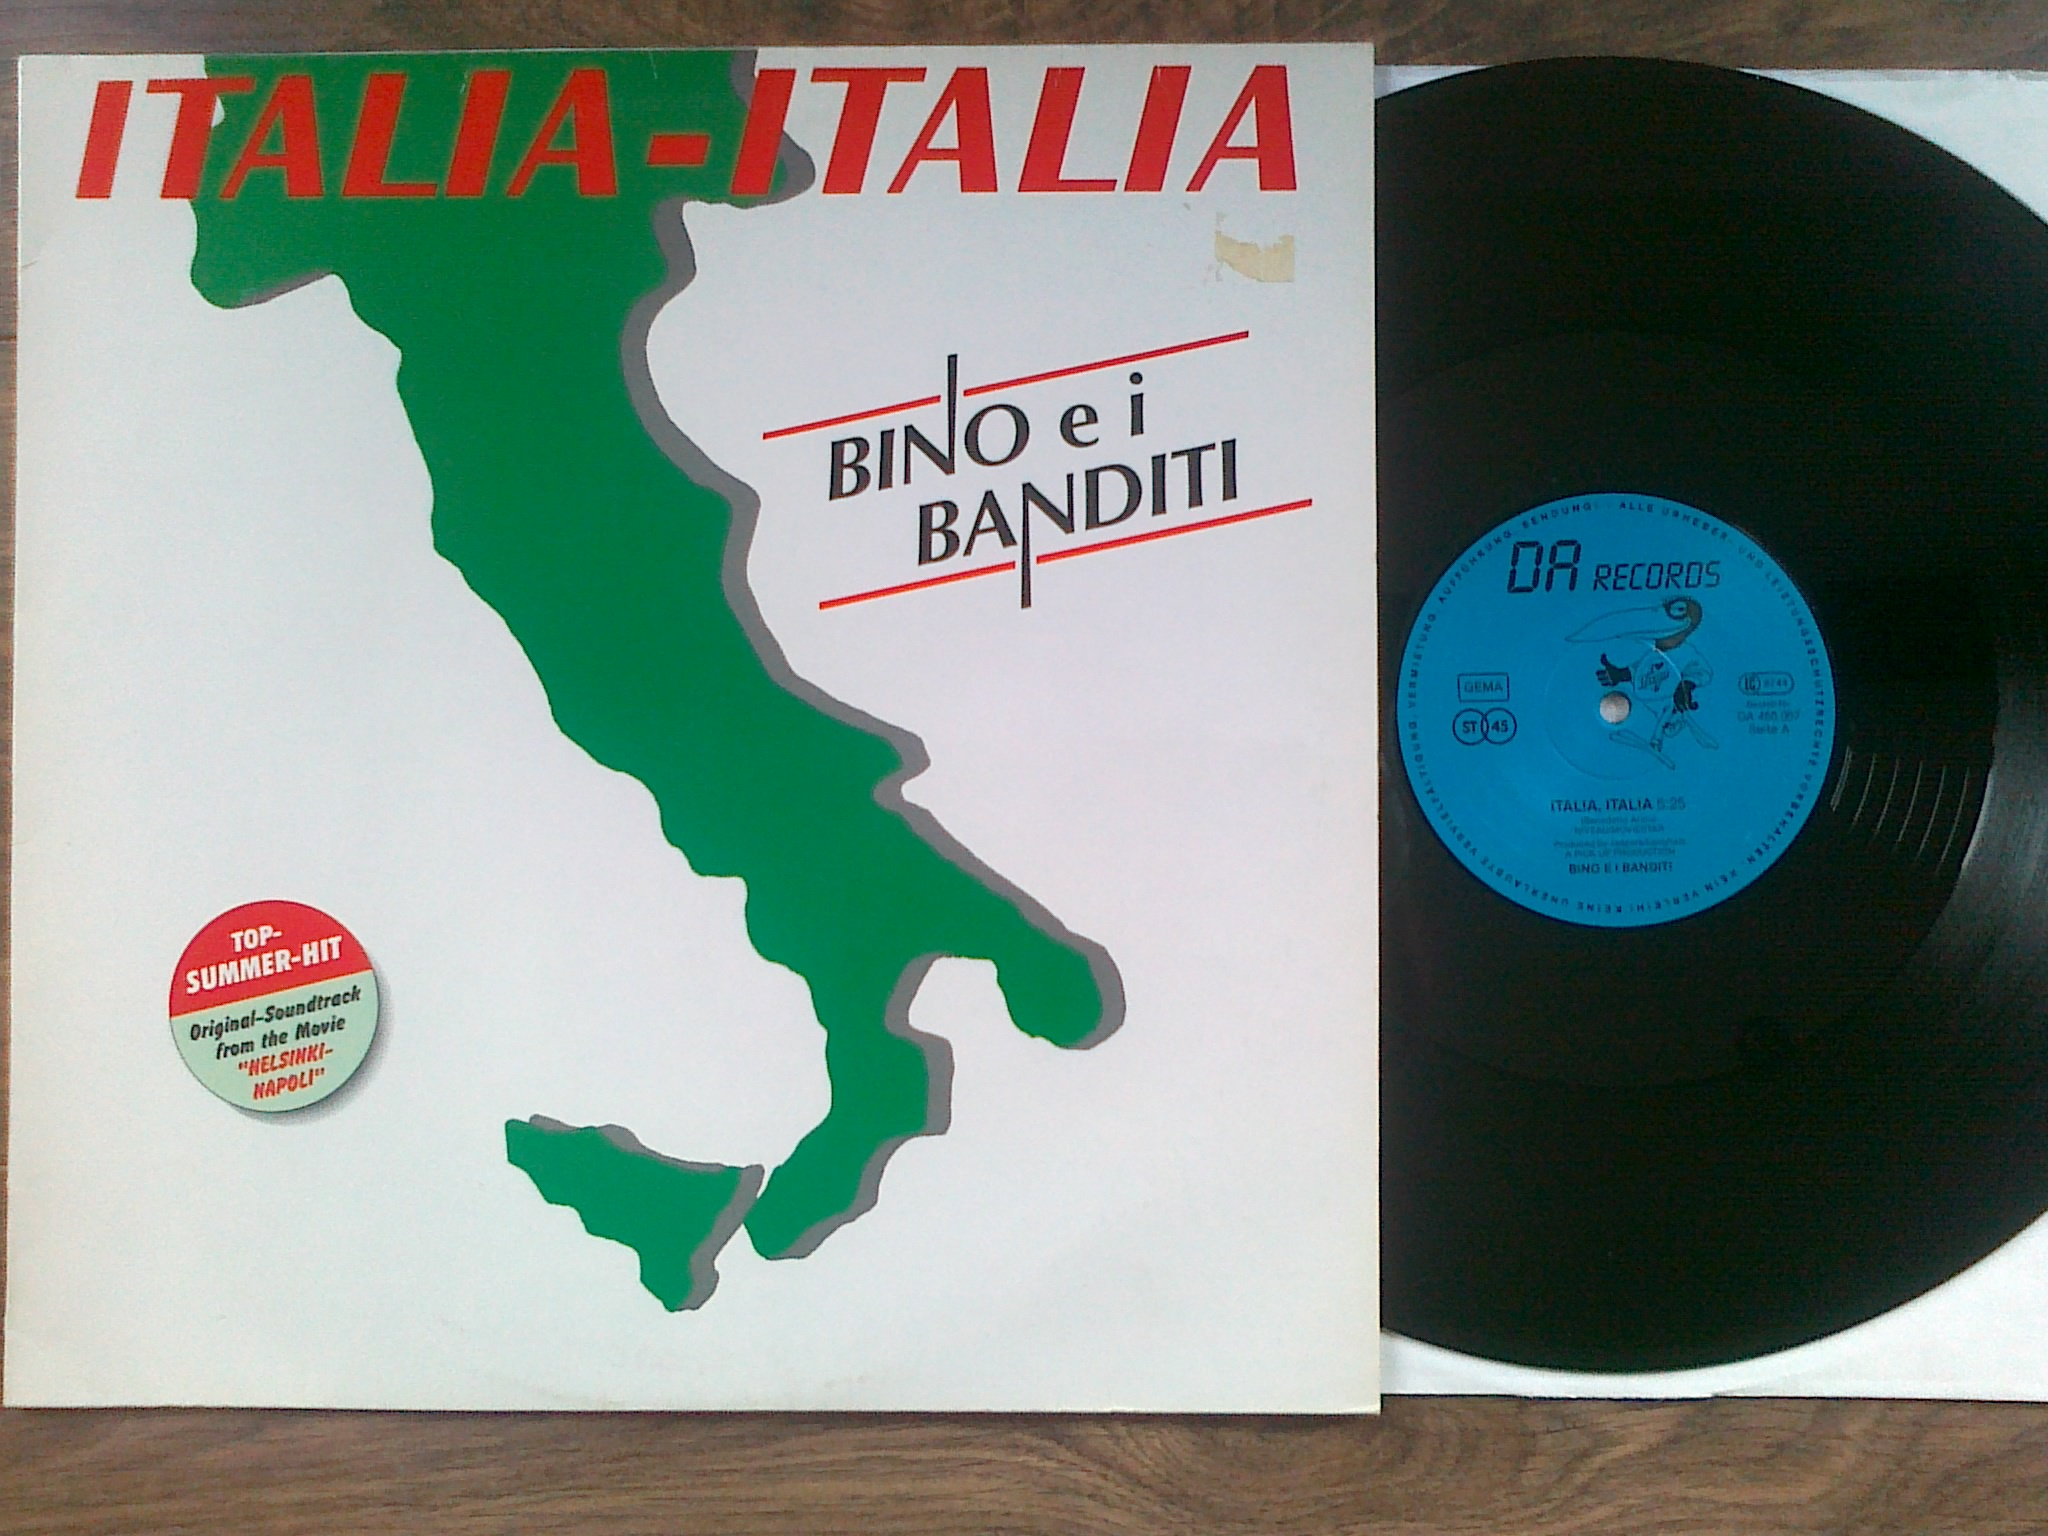 Bino Ei Banditi - Italia Italia